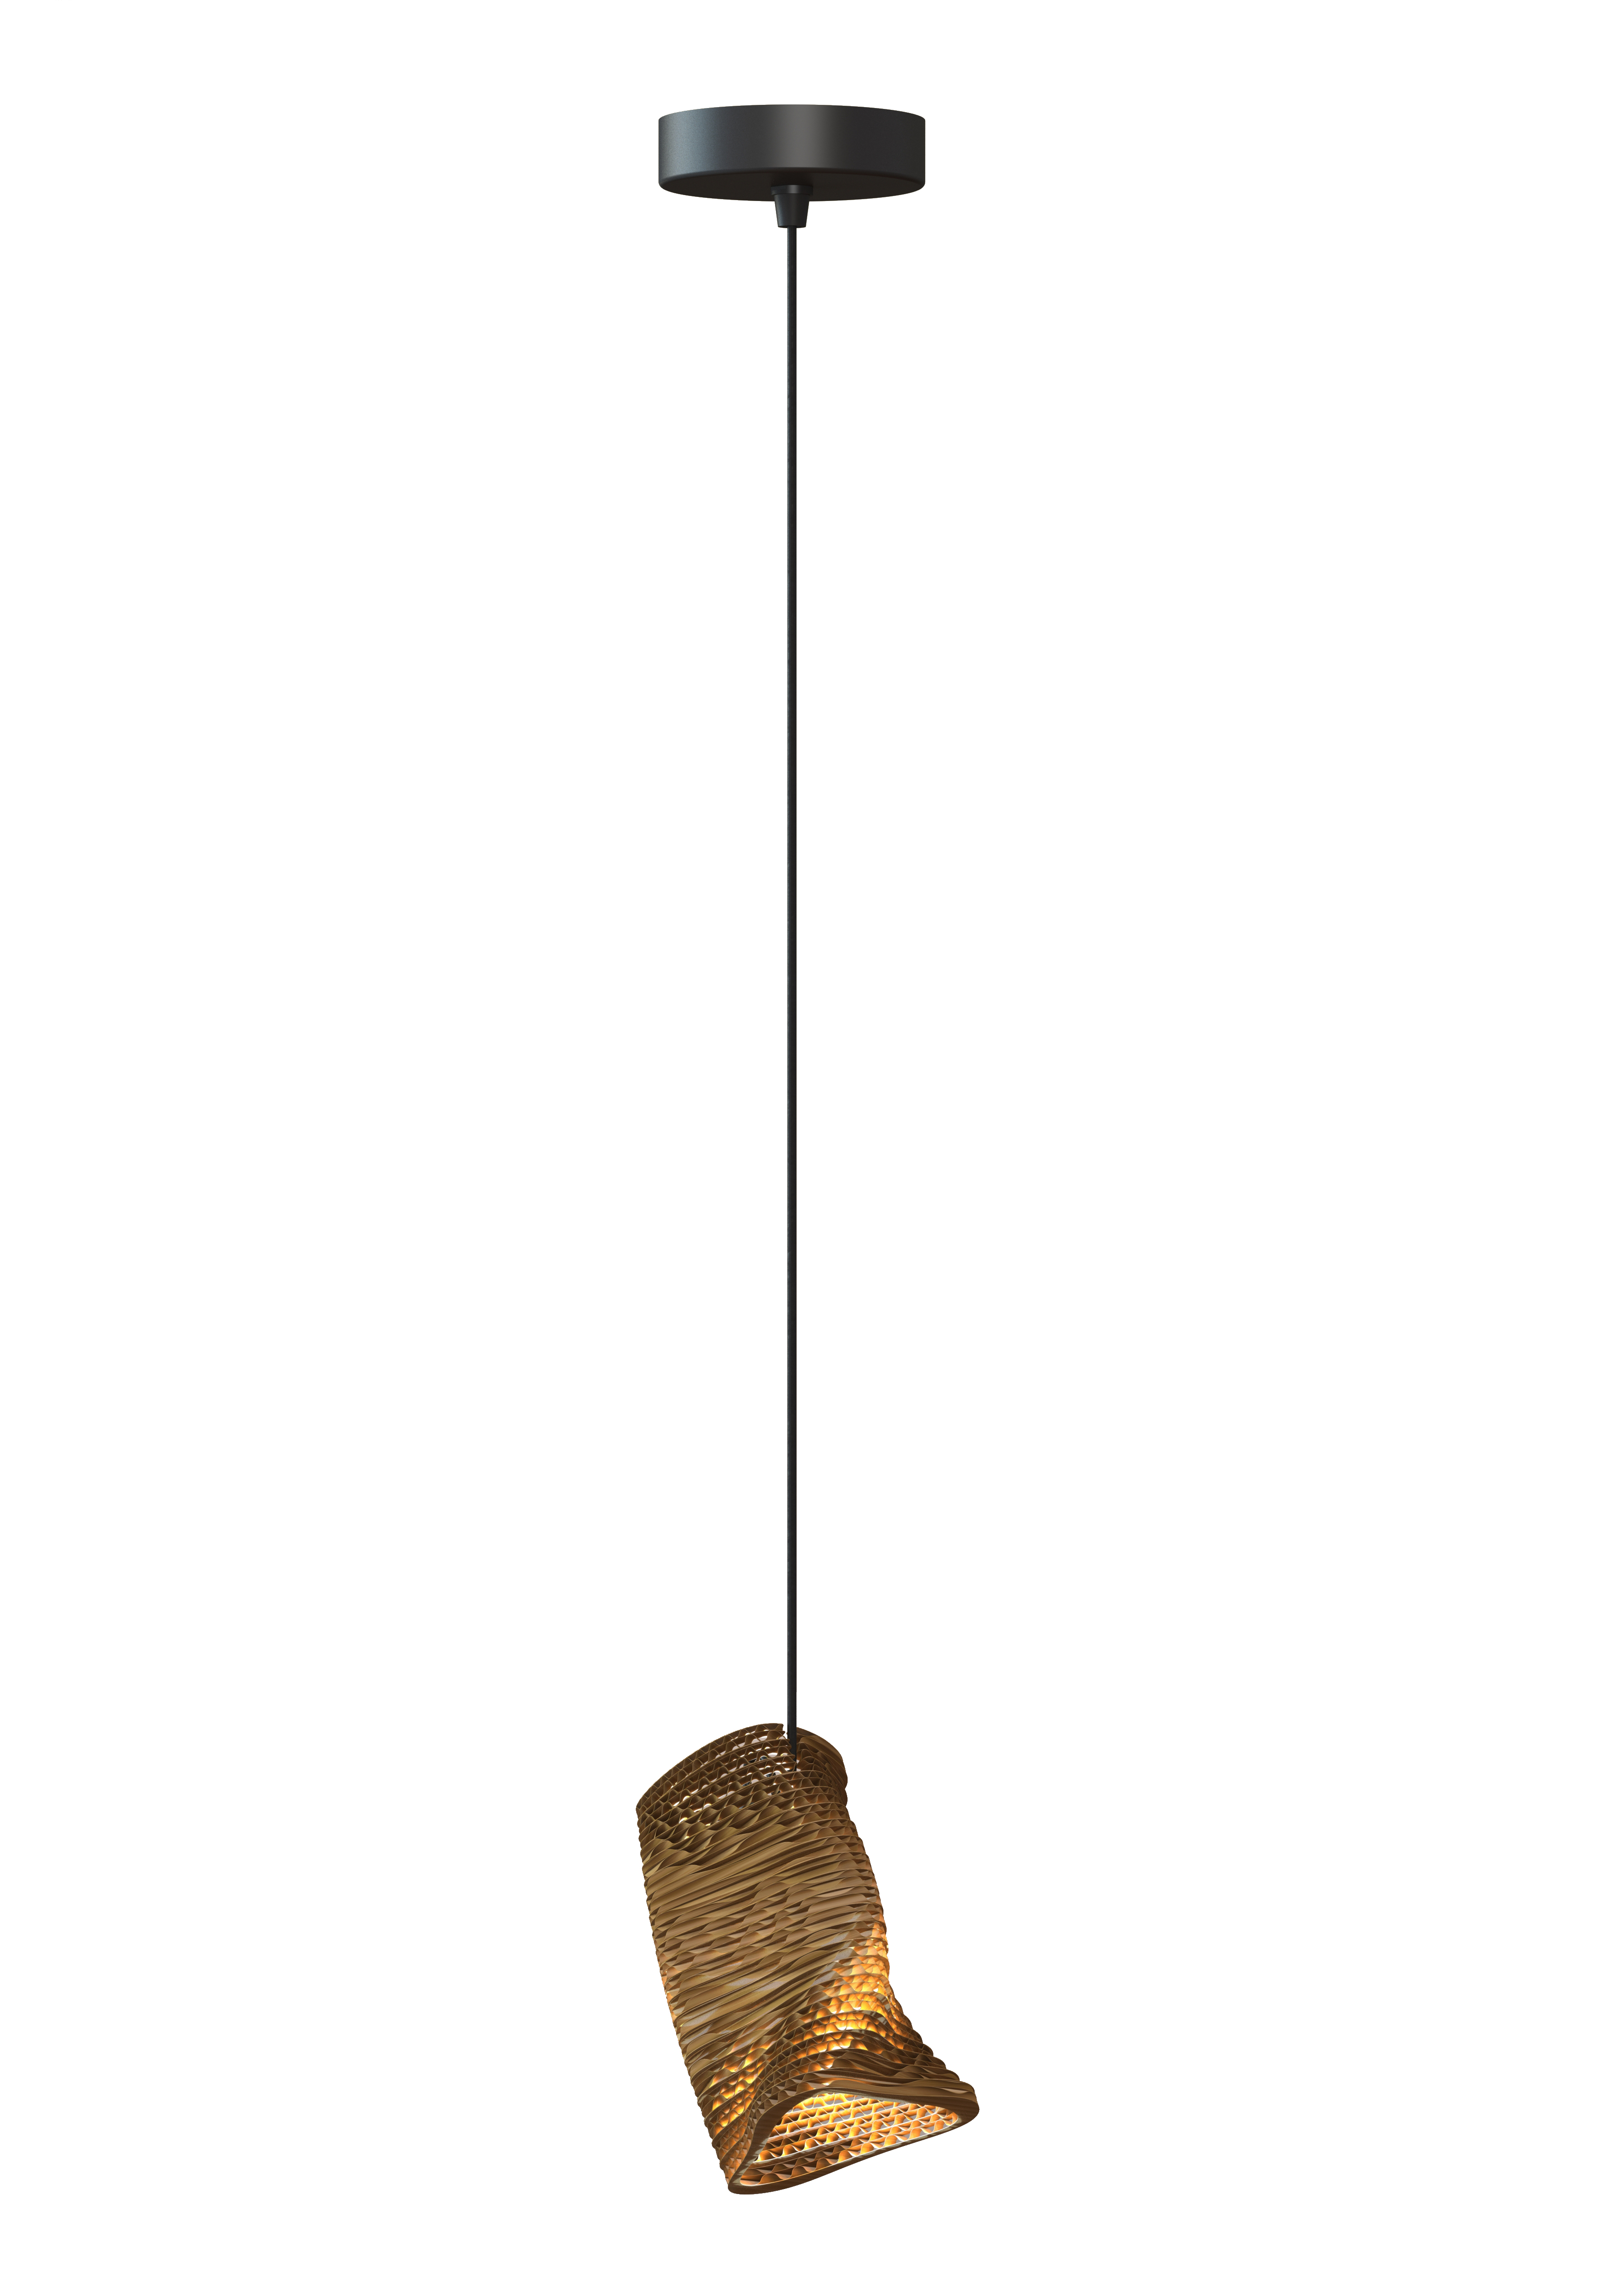 Moa single rippvalgusti 6W G9; Ø 2.5cm; pruun